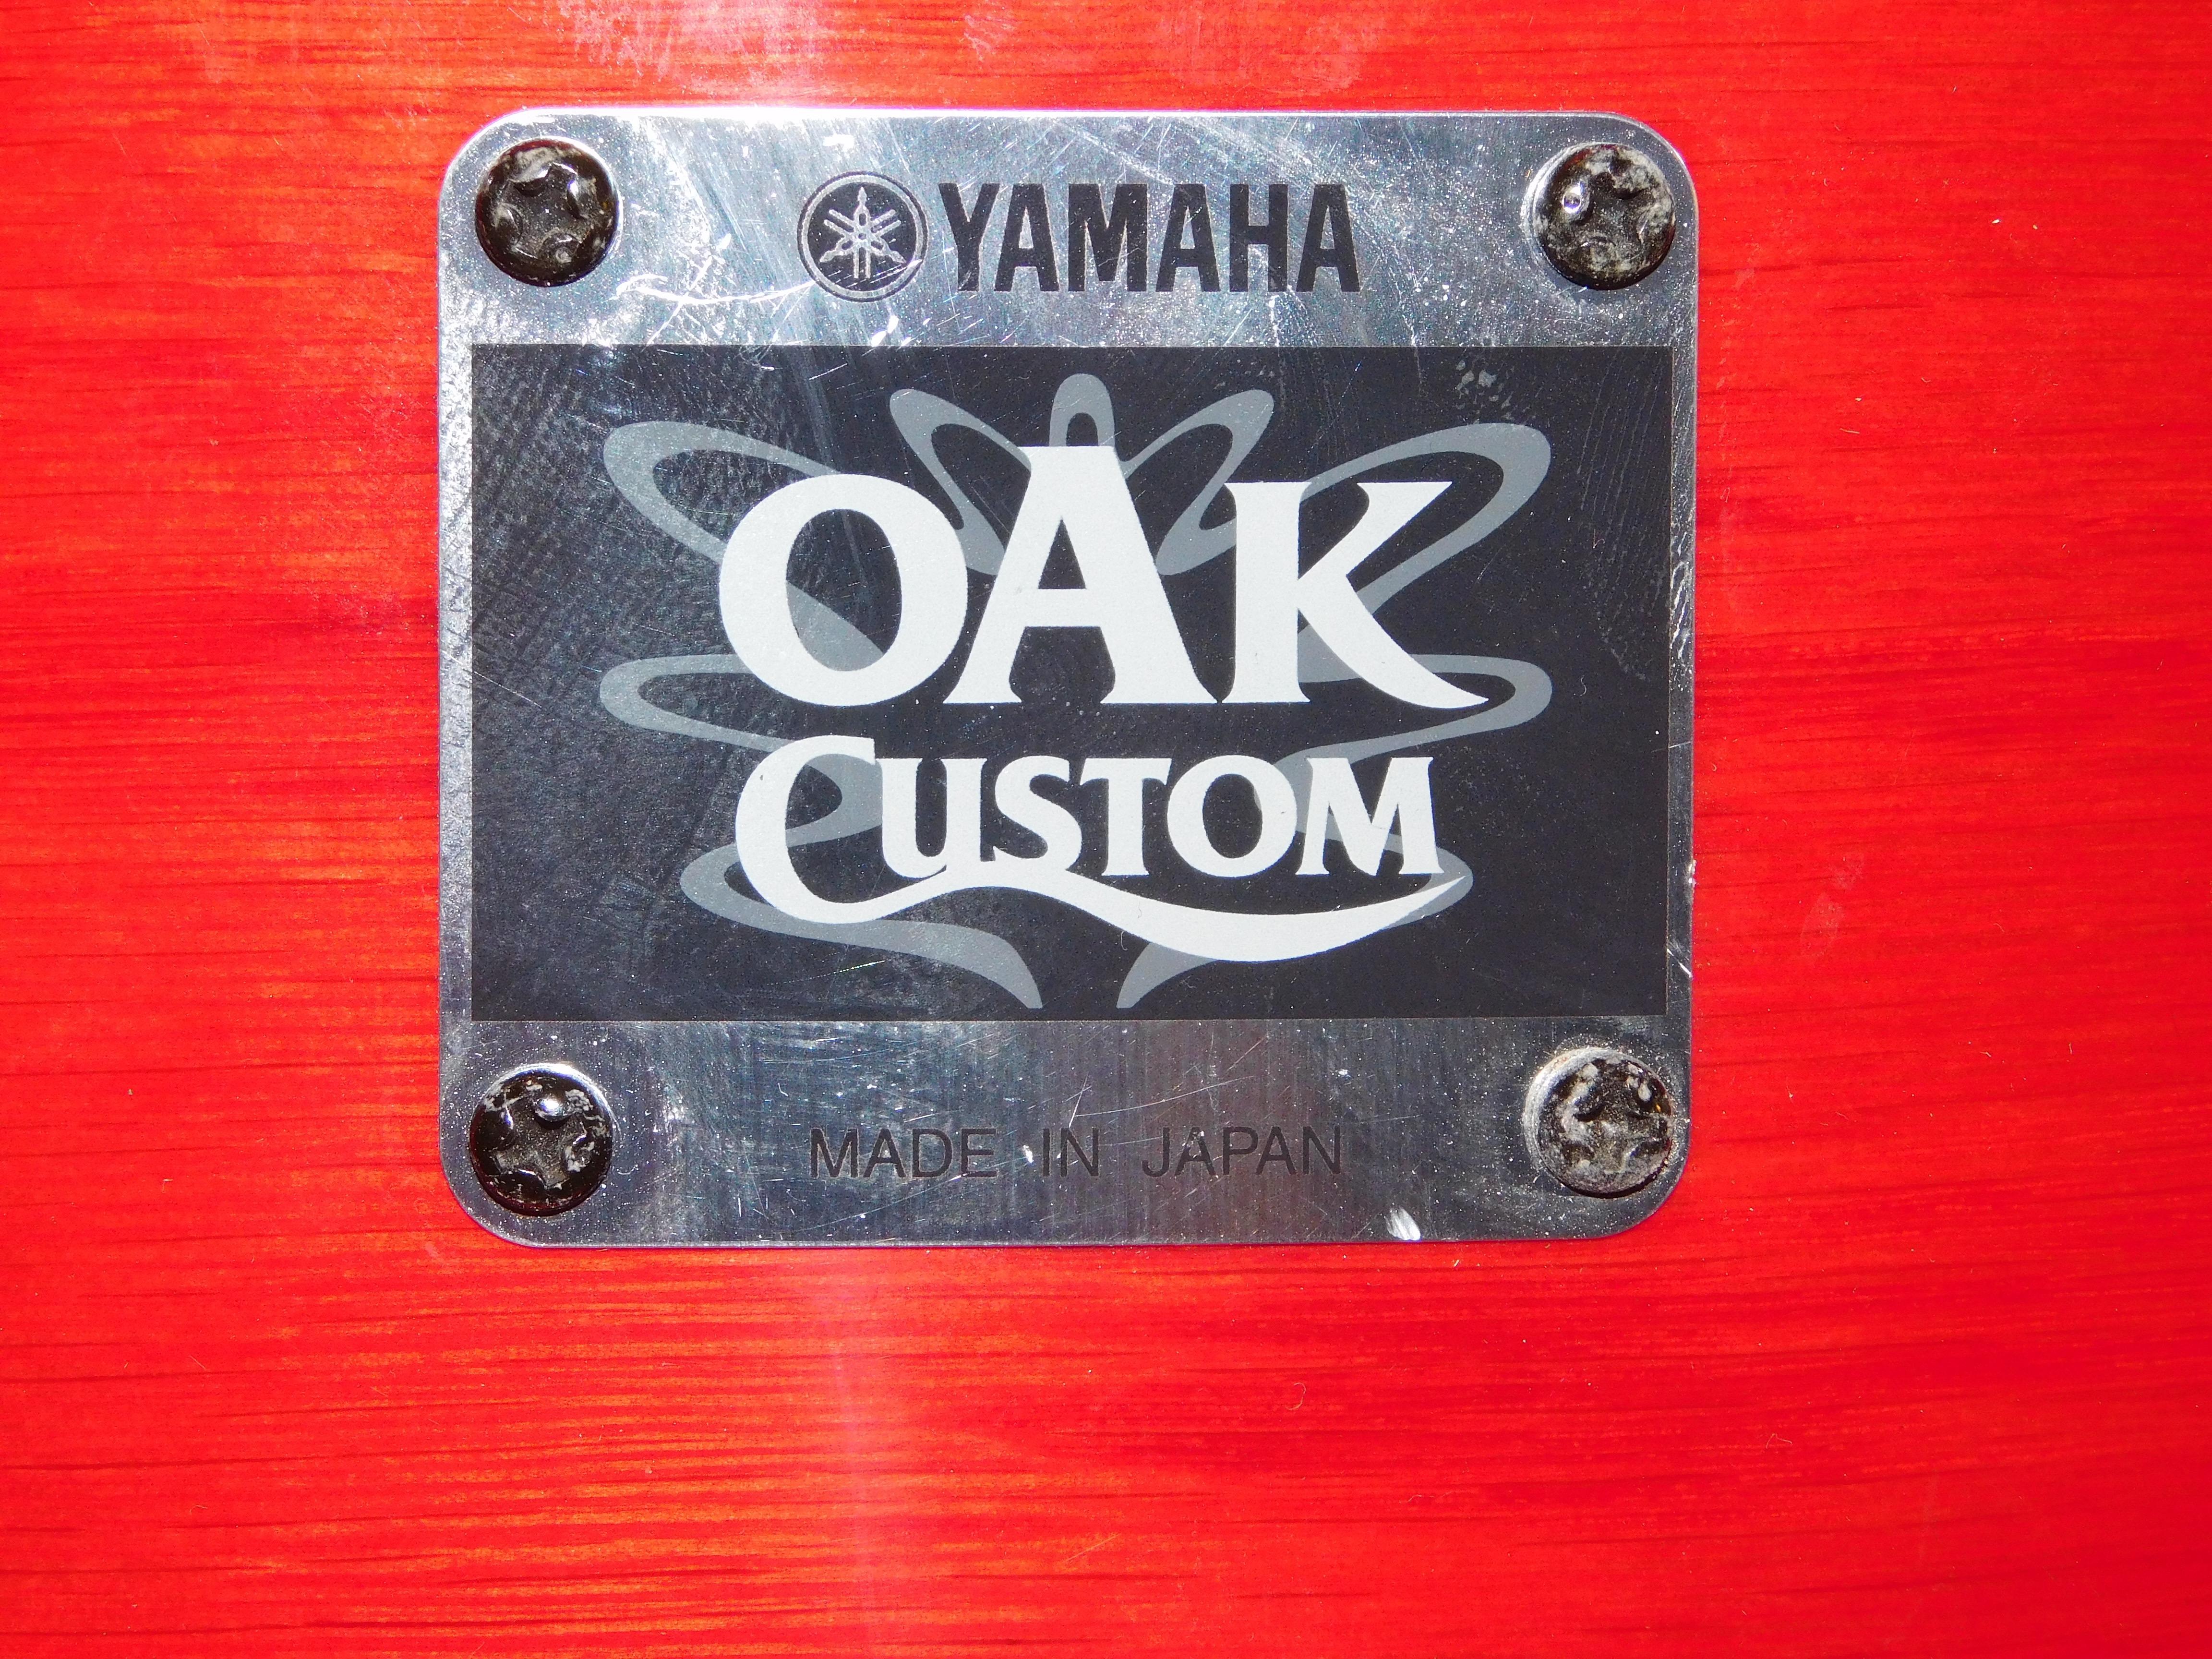 photo yamaha oak custom ny0t4m yamaha oak custom ny0t4m 19860 1661226 audiofanzine. Black Bedroom Furniture Sets. Home Design Ideas